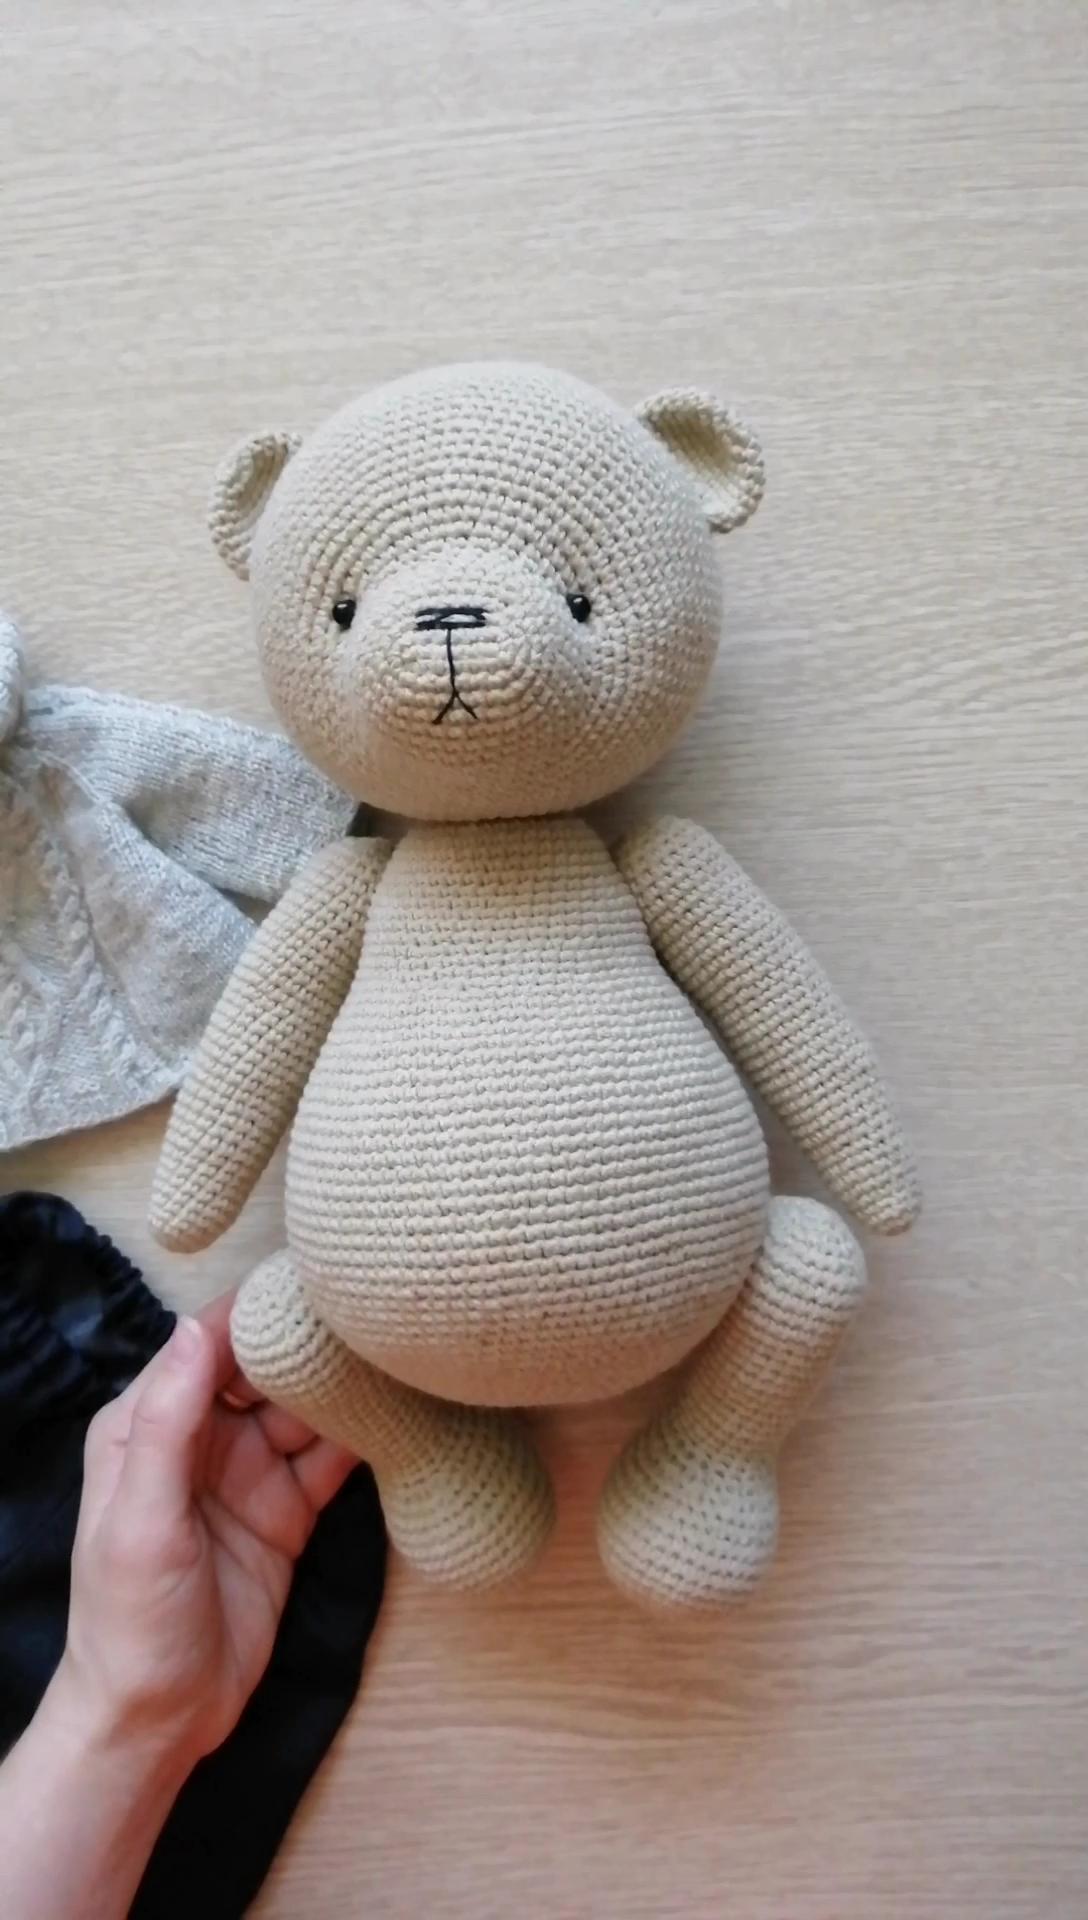 Crochet bear amigurumi pattern   Amiguroom Toys   1920x1088